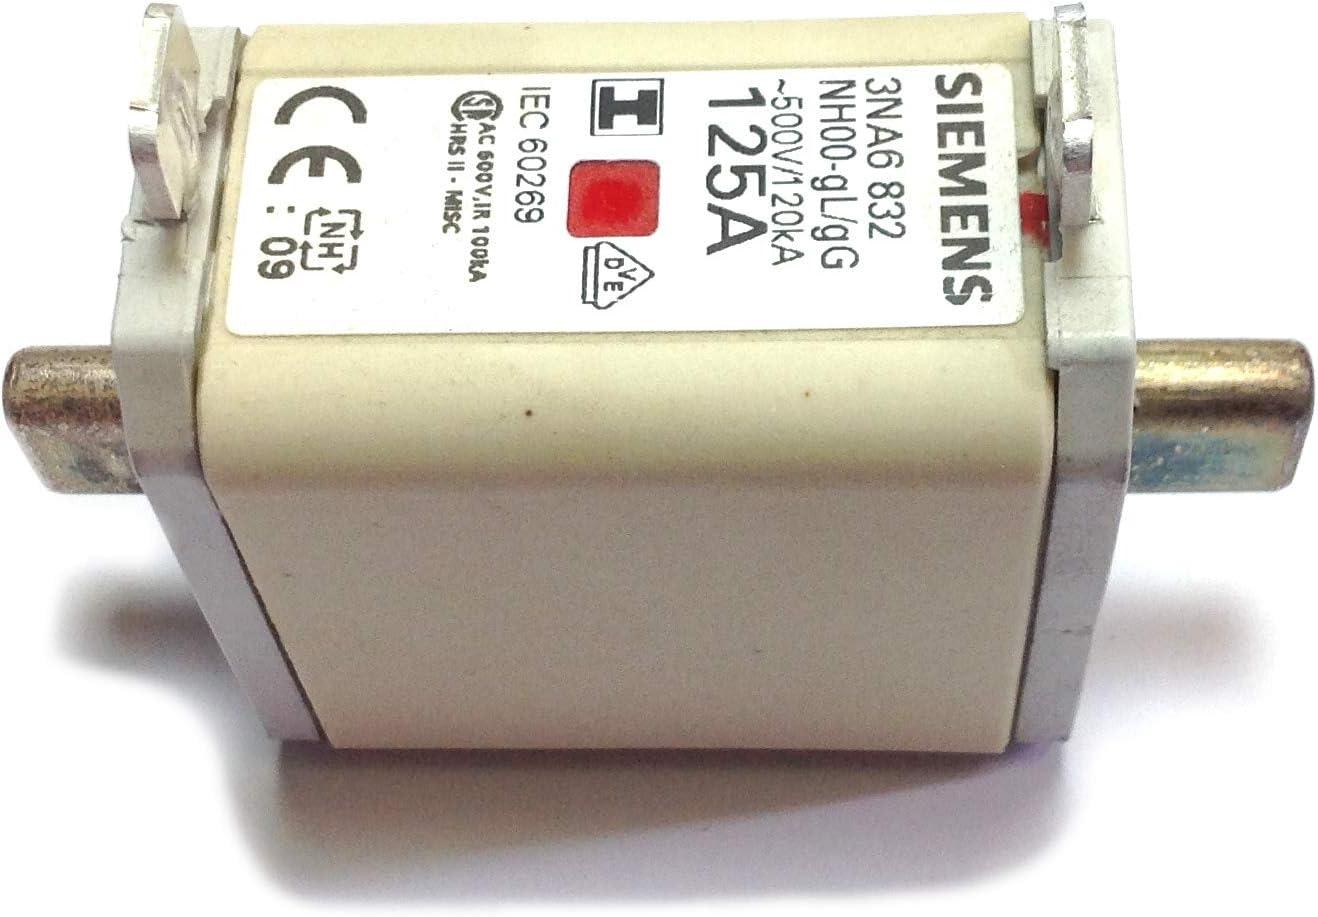 Siemens/ /nh-150/500/V t-00/Sicherung 125/A Indikator Central